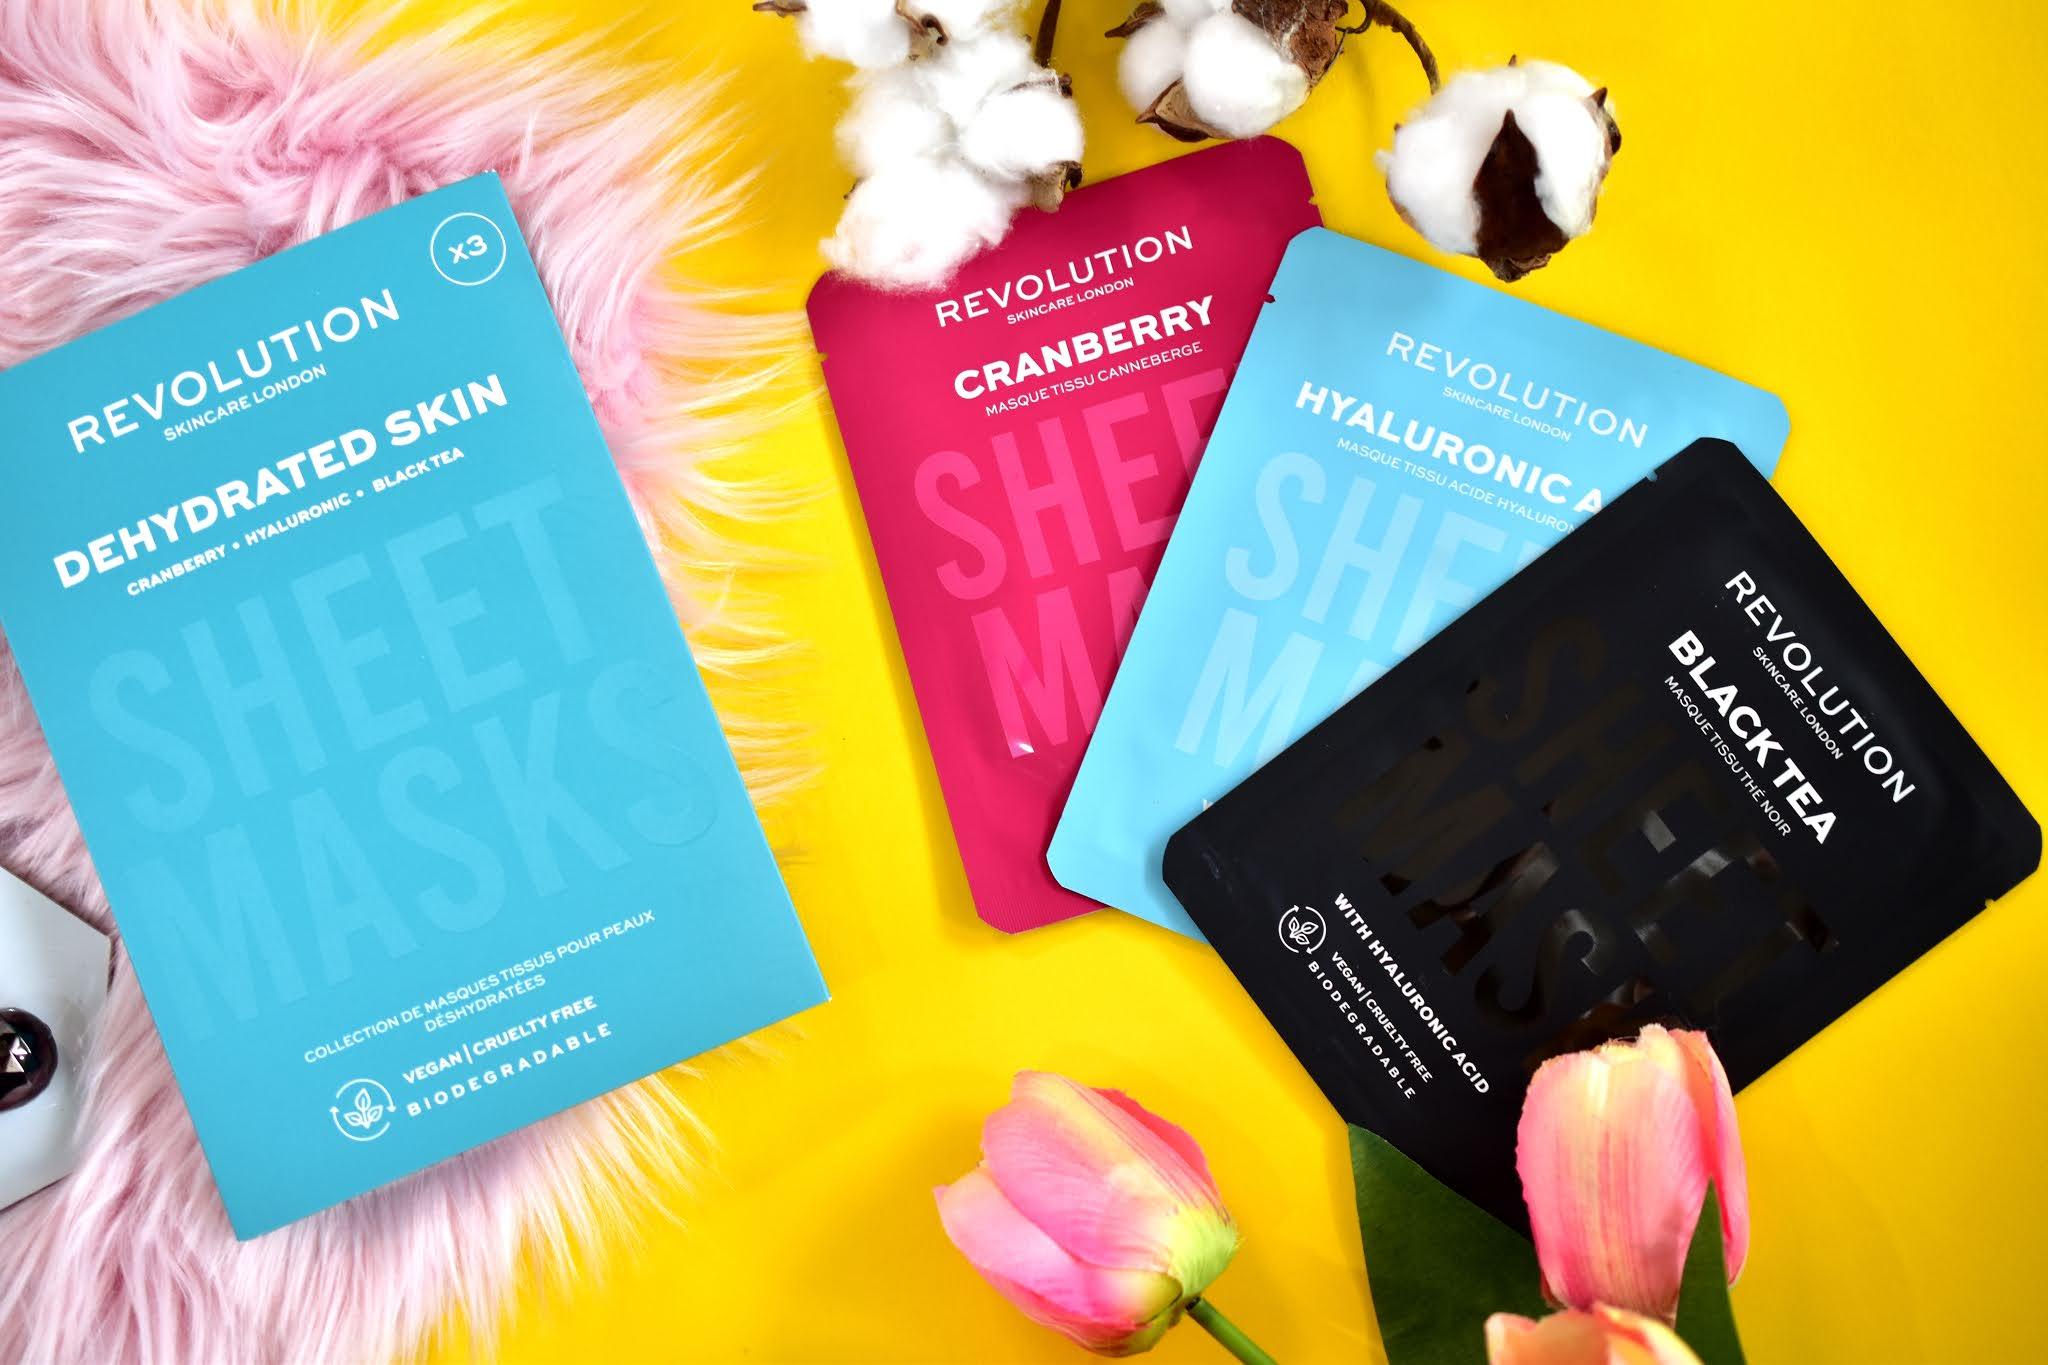 Revolution Skincare Dehydrated Skin Sheet Masks